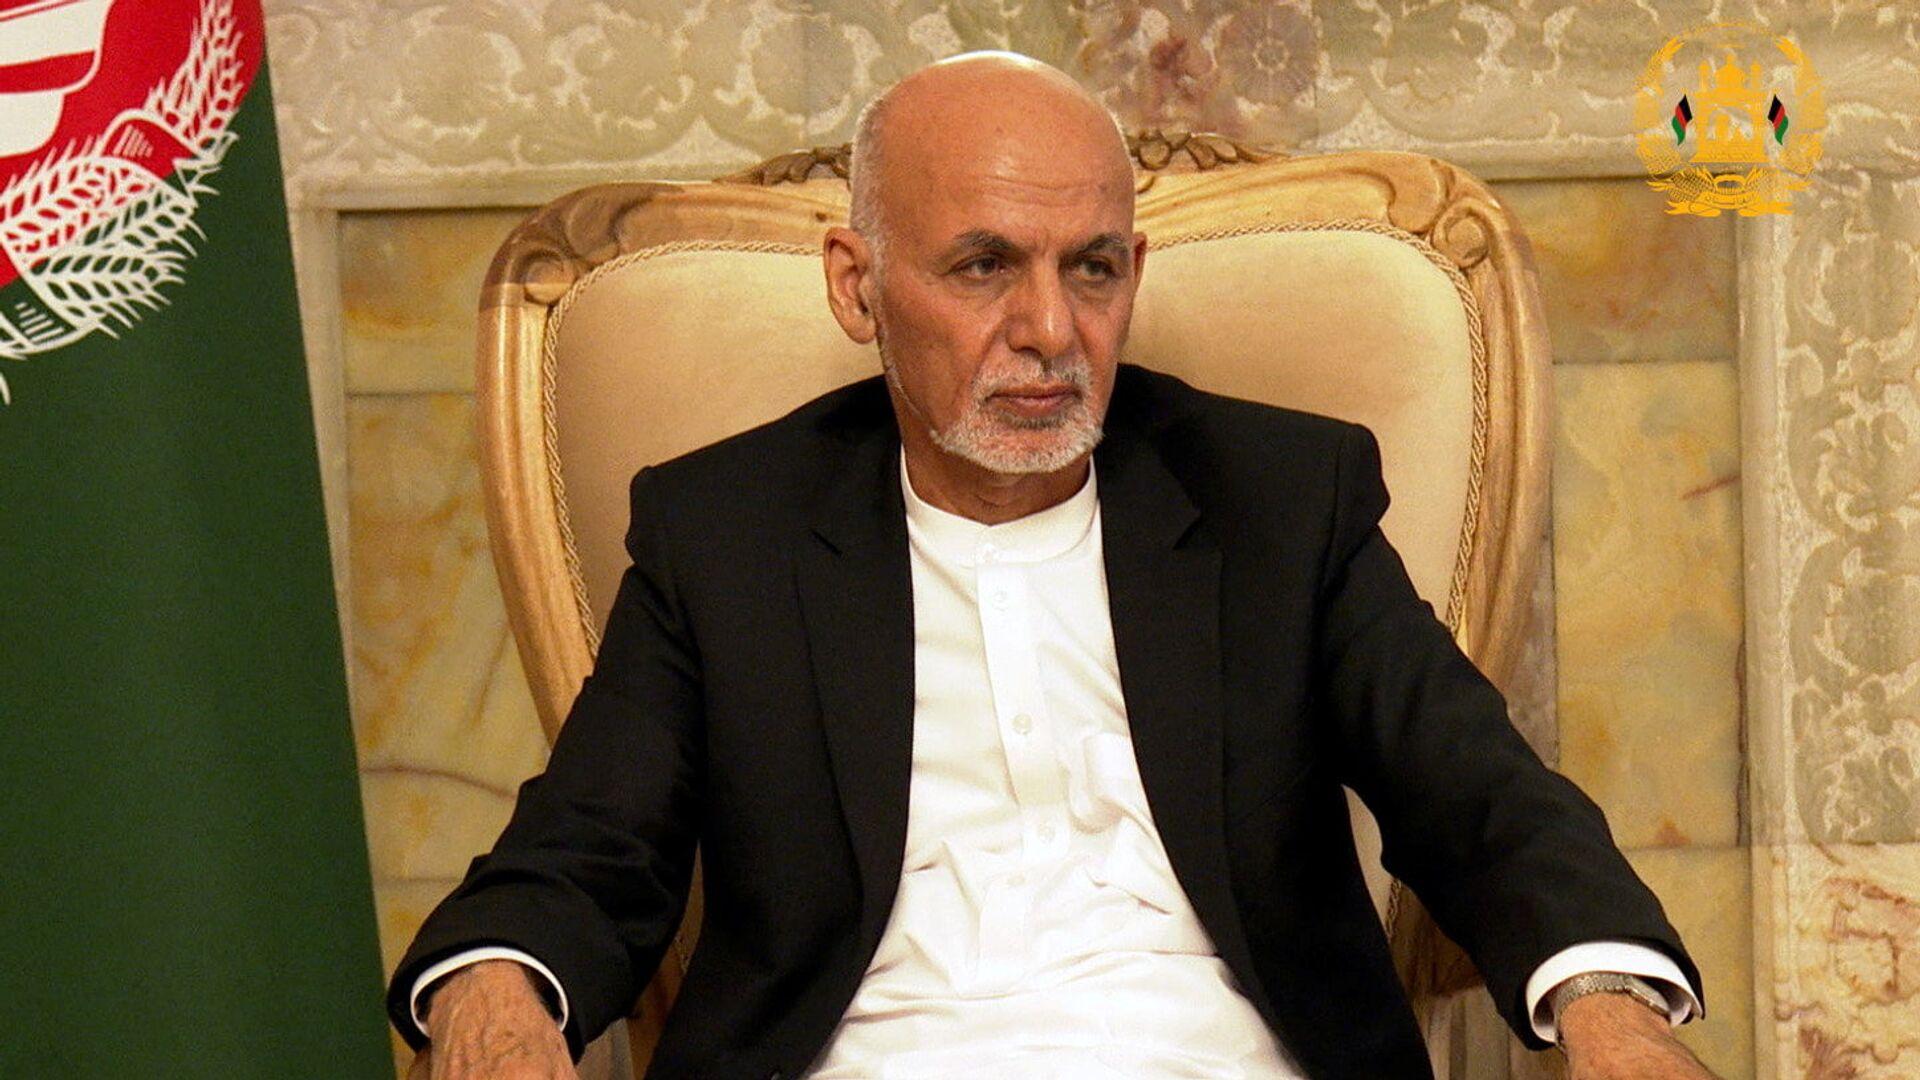 Президент Афганистана Ашраф Гани - Sputnik Ўзбекистон, 1920, 03.10.2021